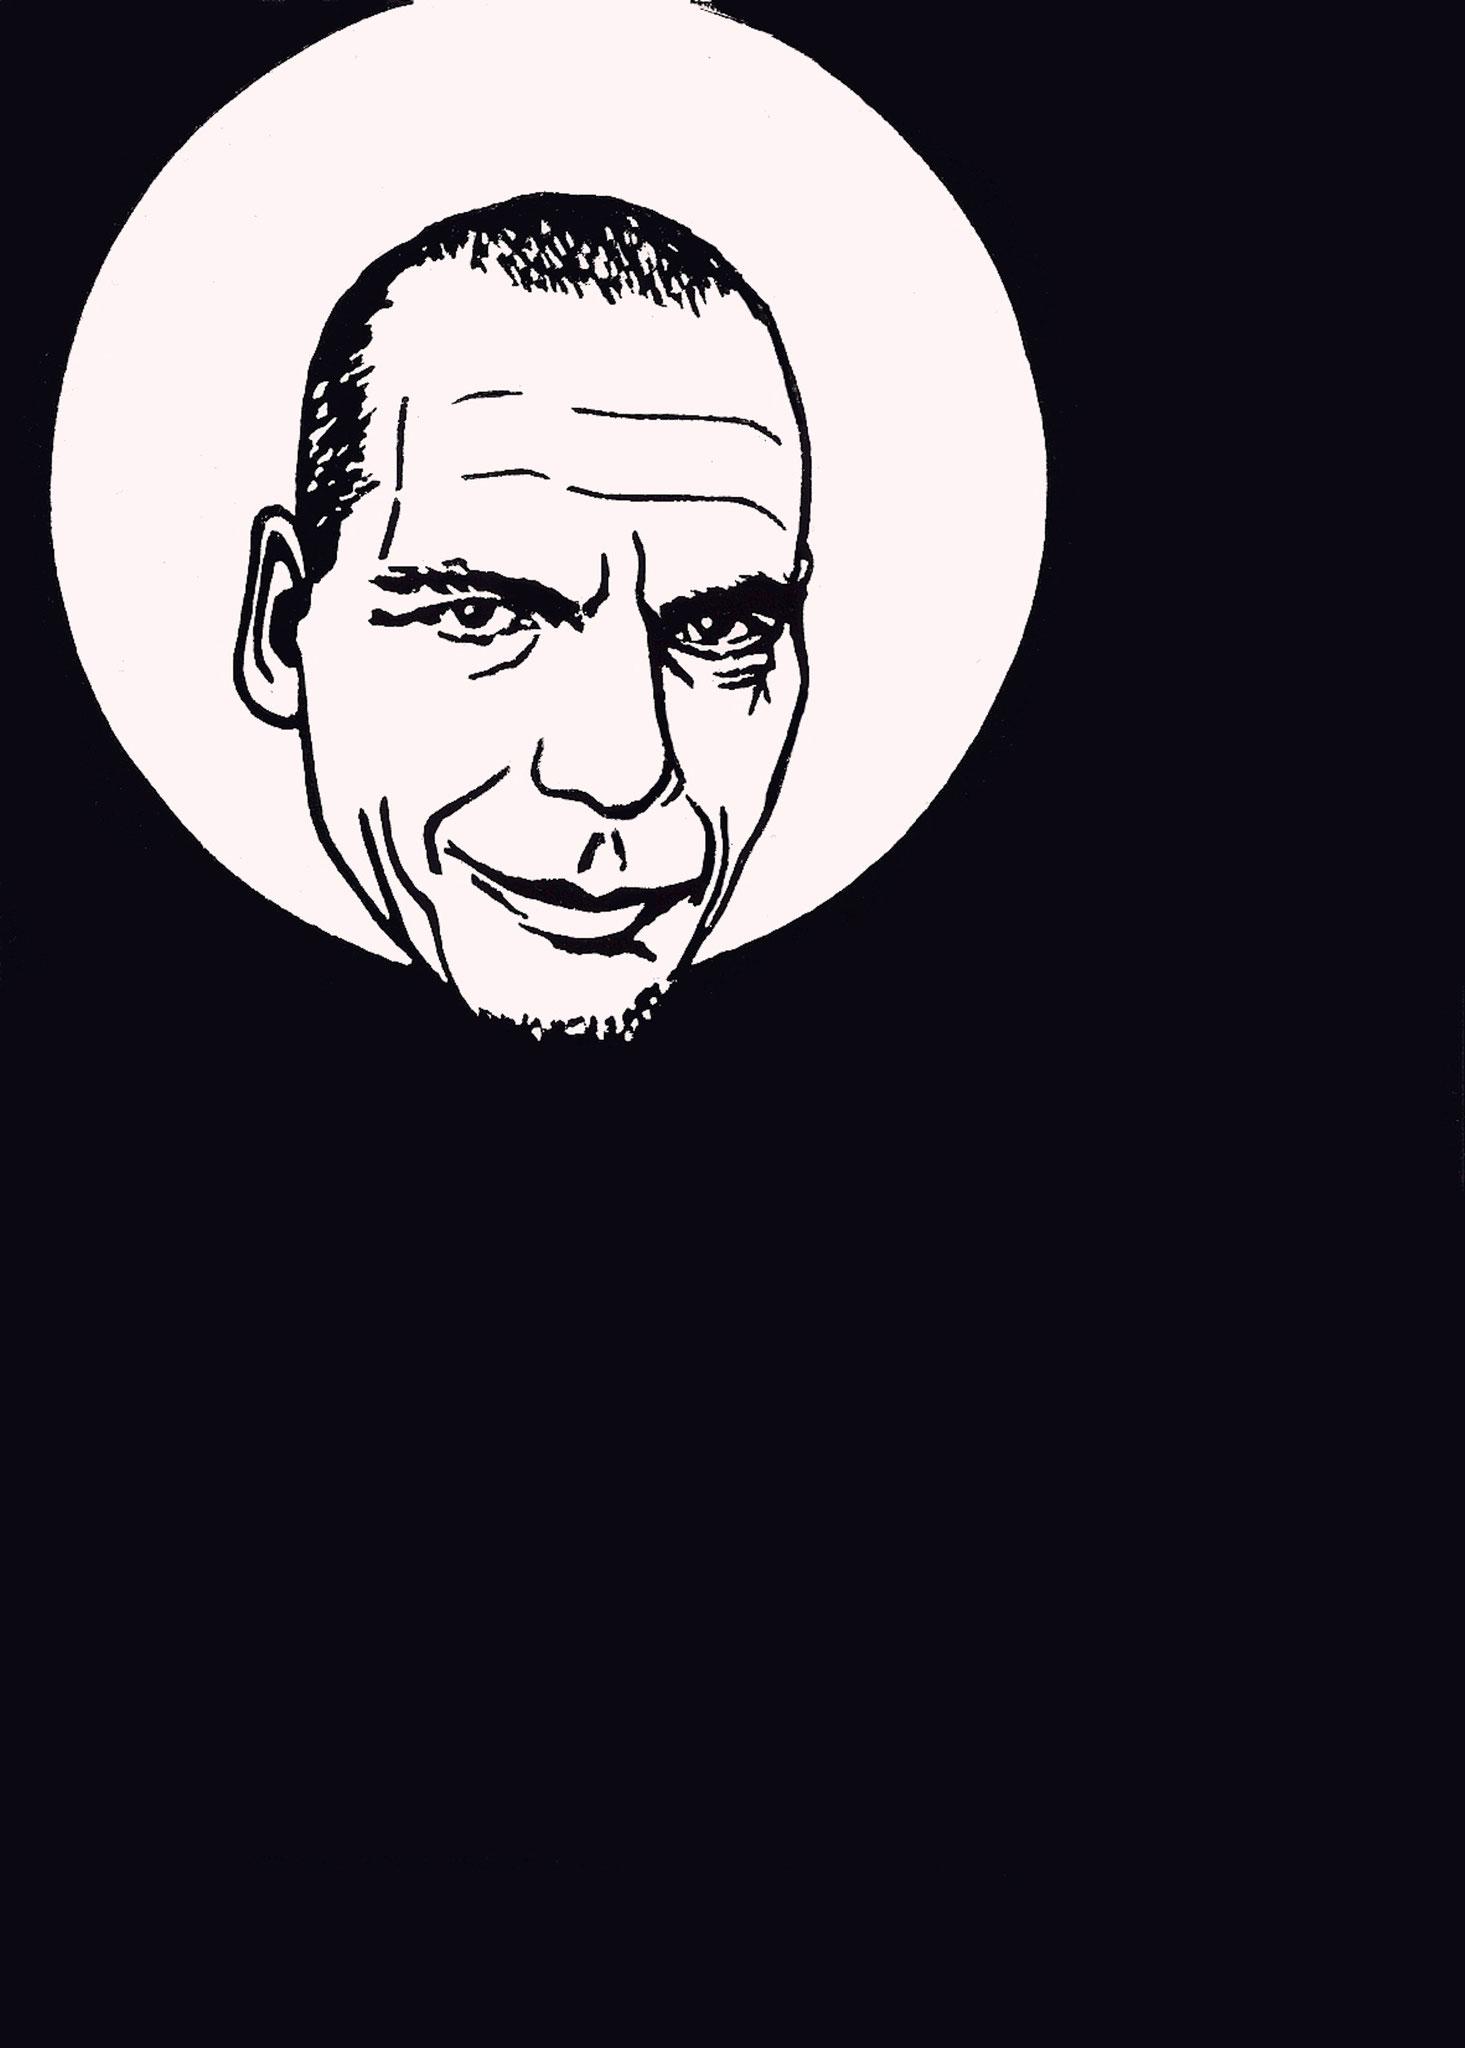 Yanis Varoufakis, 02/02/2018, Edition 5, A5